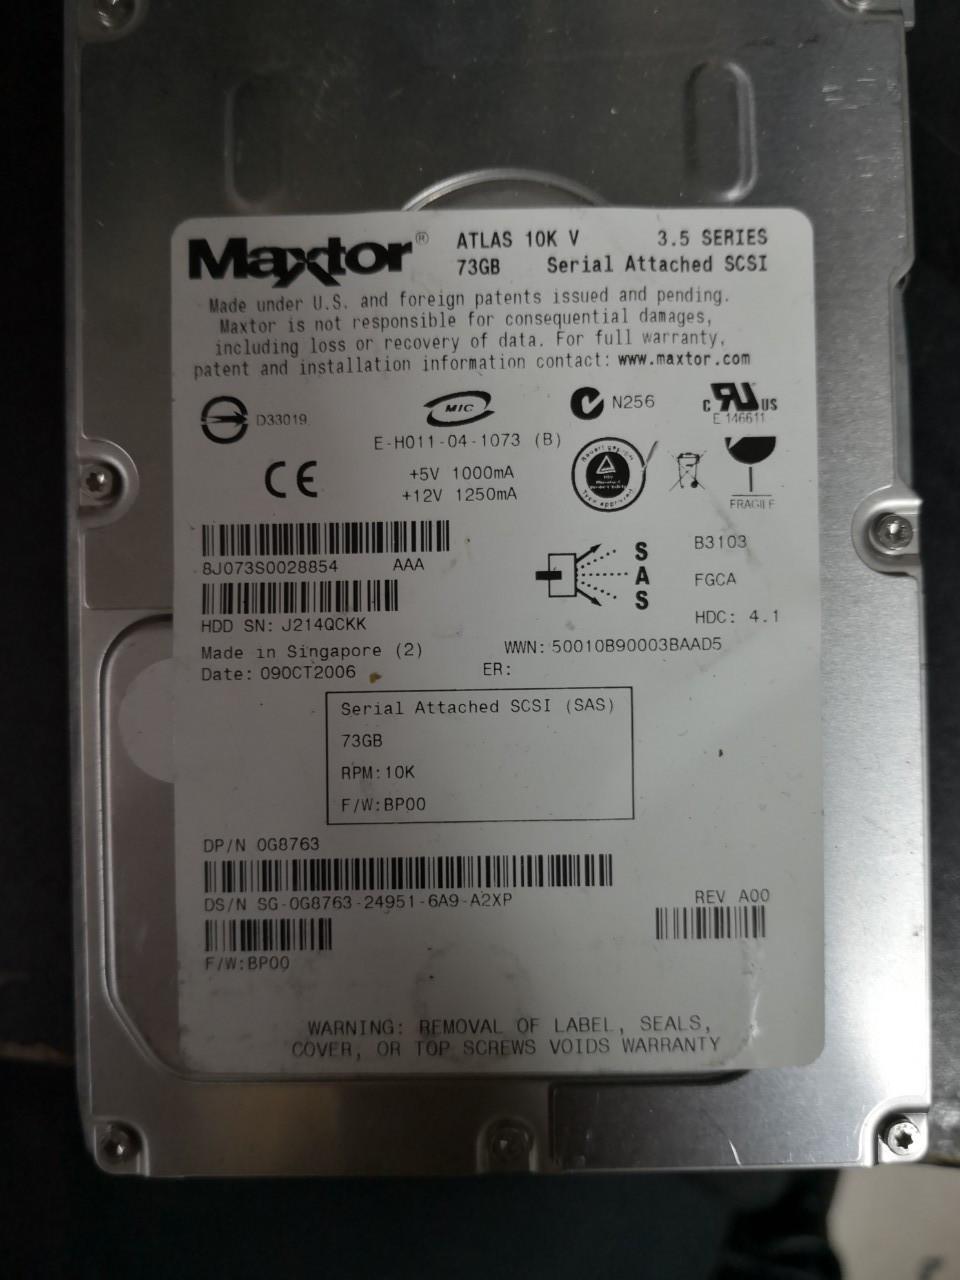 Жесткий диск Maxtor Atlas 10K V 300GB 8J300S0088856 SAS бу